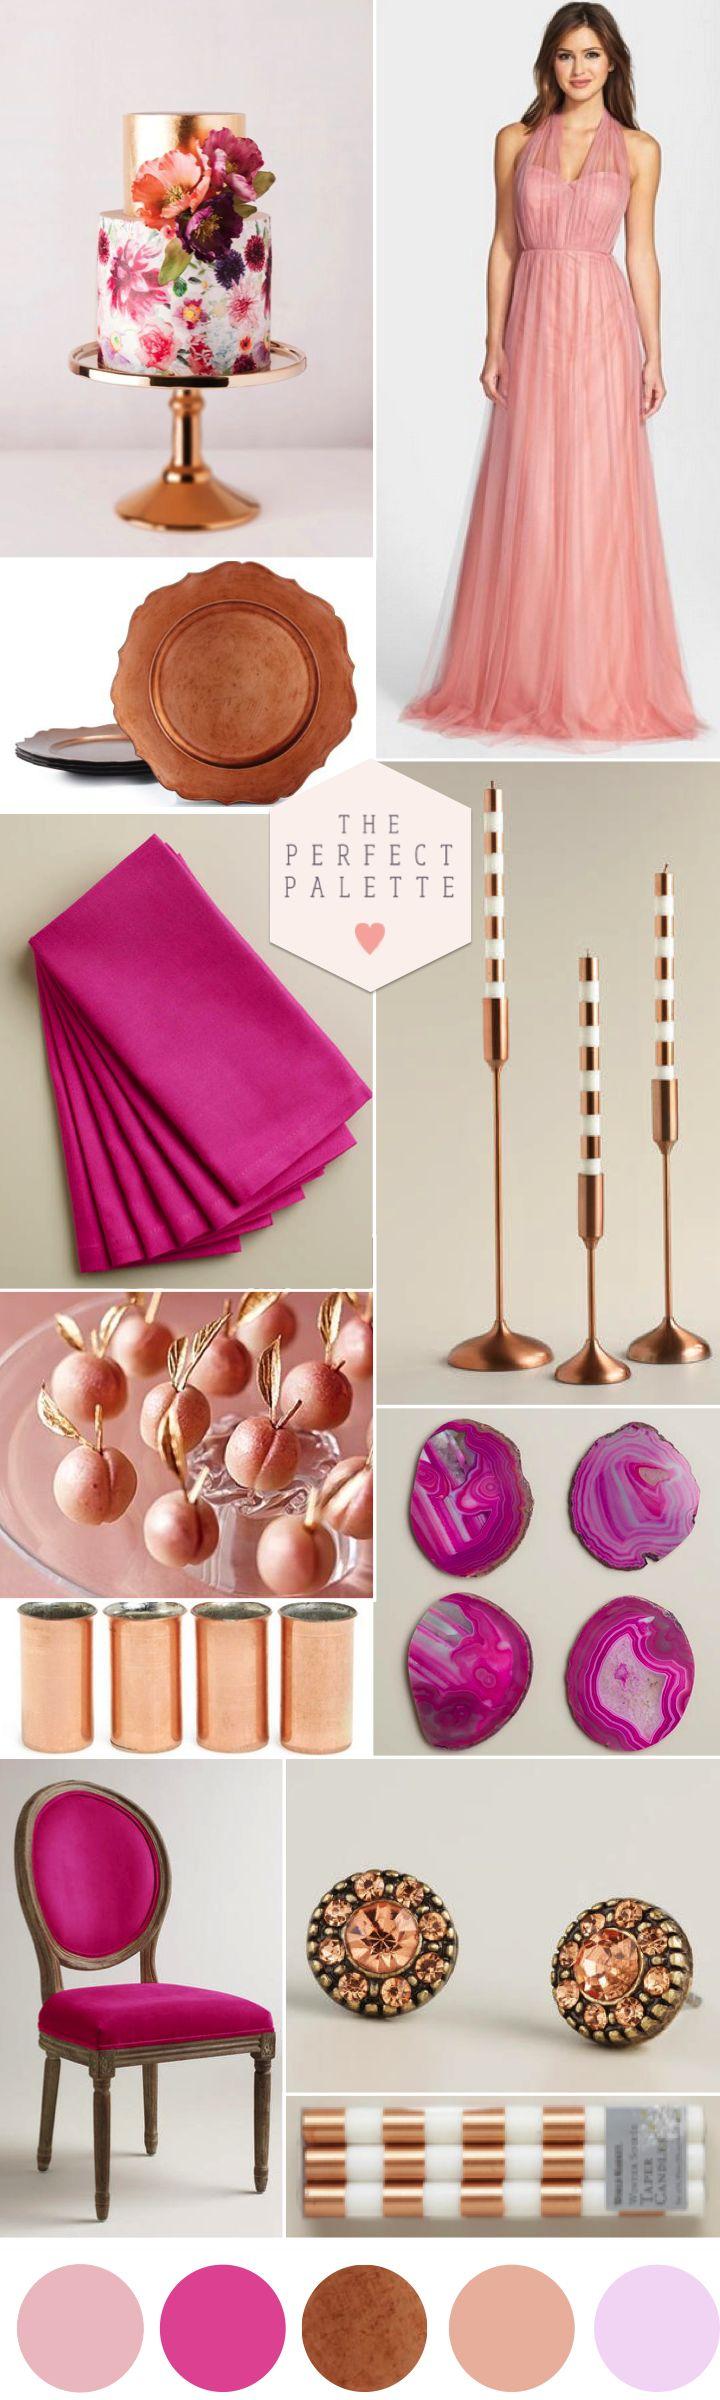 Radiant Orchid, Copper Blush: Wedding Color Inspiration